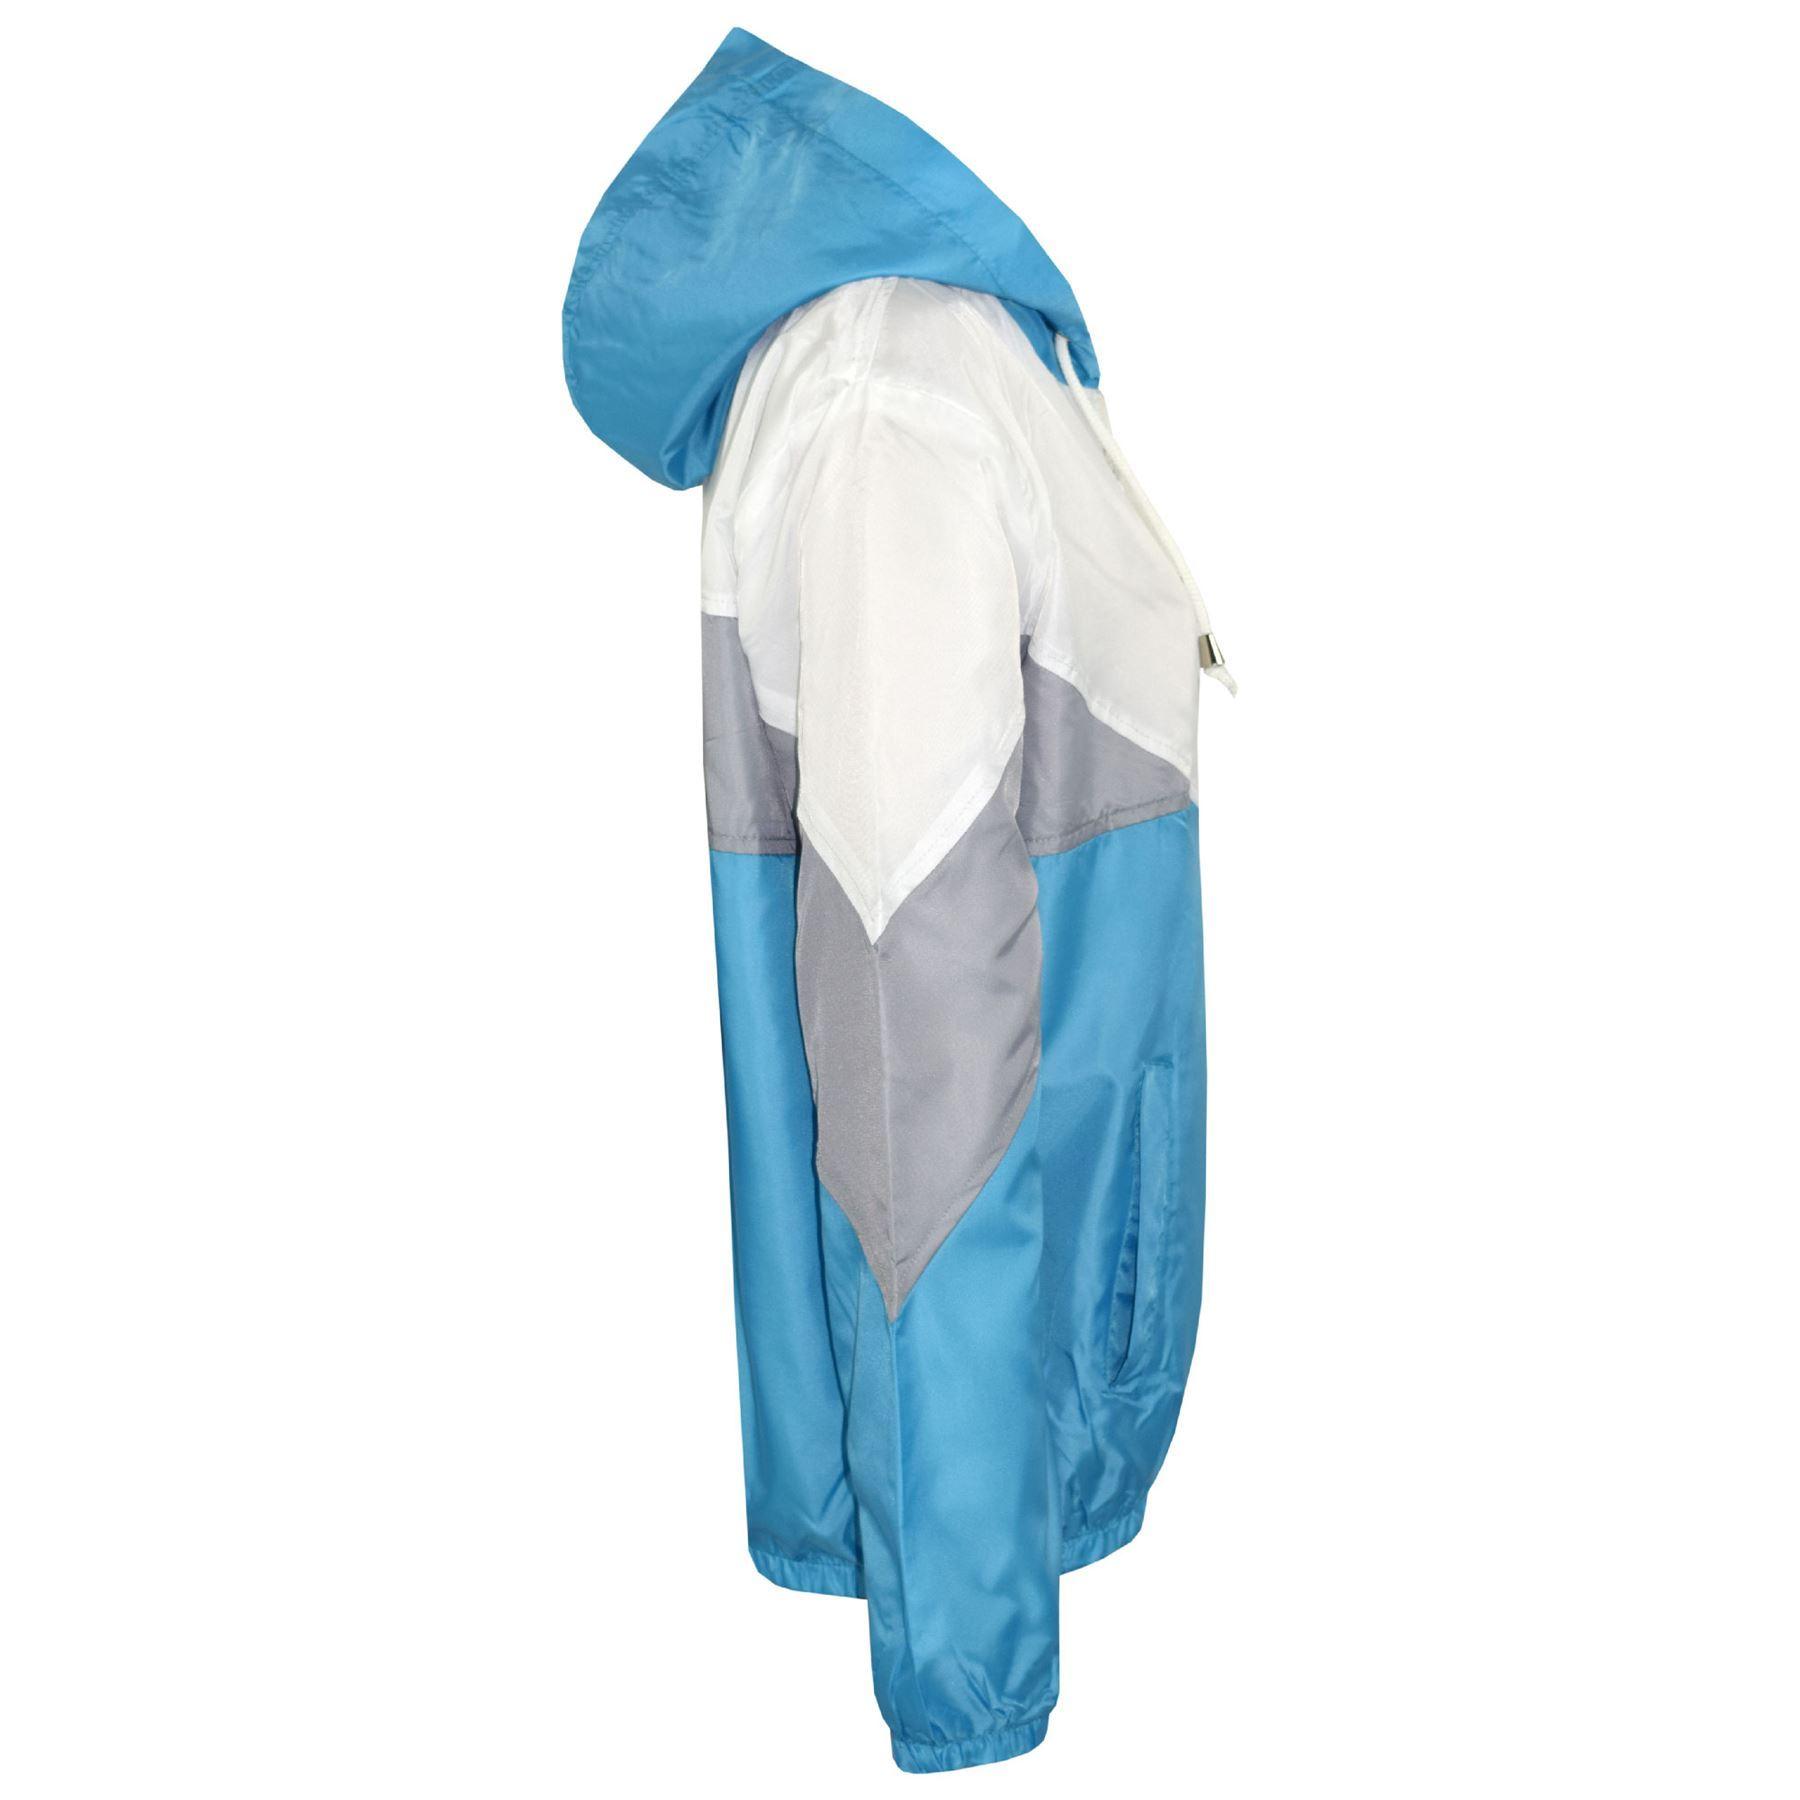 A2Z 4 Kids/® Kids Girls Boys Windbreaker Jackets Designers Contrast Panel Black Hooded Light Weight Waterproof Kagoul Rain Mac Raincoat Age 5 6 7 8 9 10 11 12 13 Years